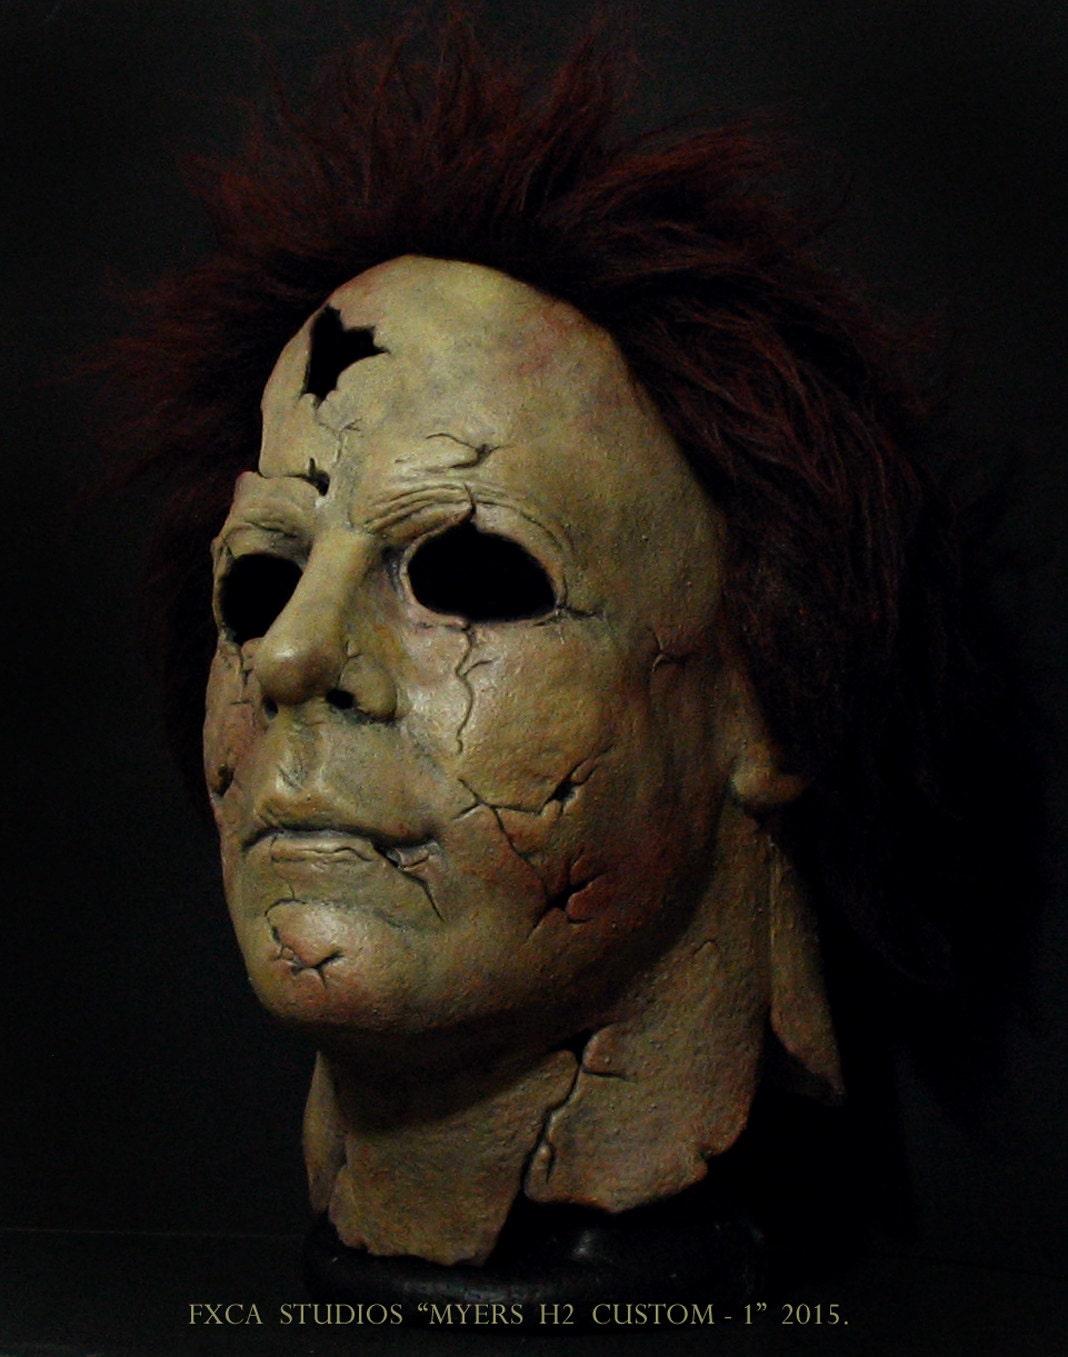 Rotten Psycho Myers H2 Custom Deluxe Latex Mask Halloween Rob